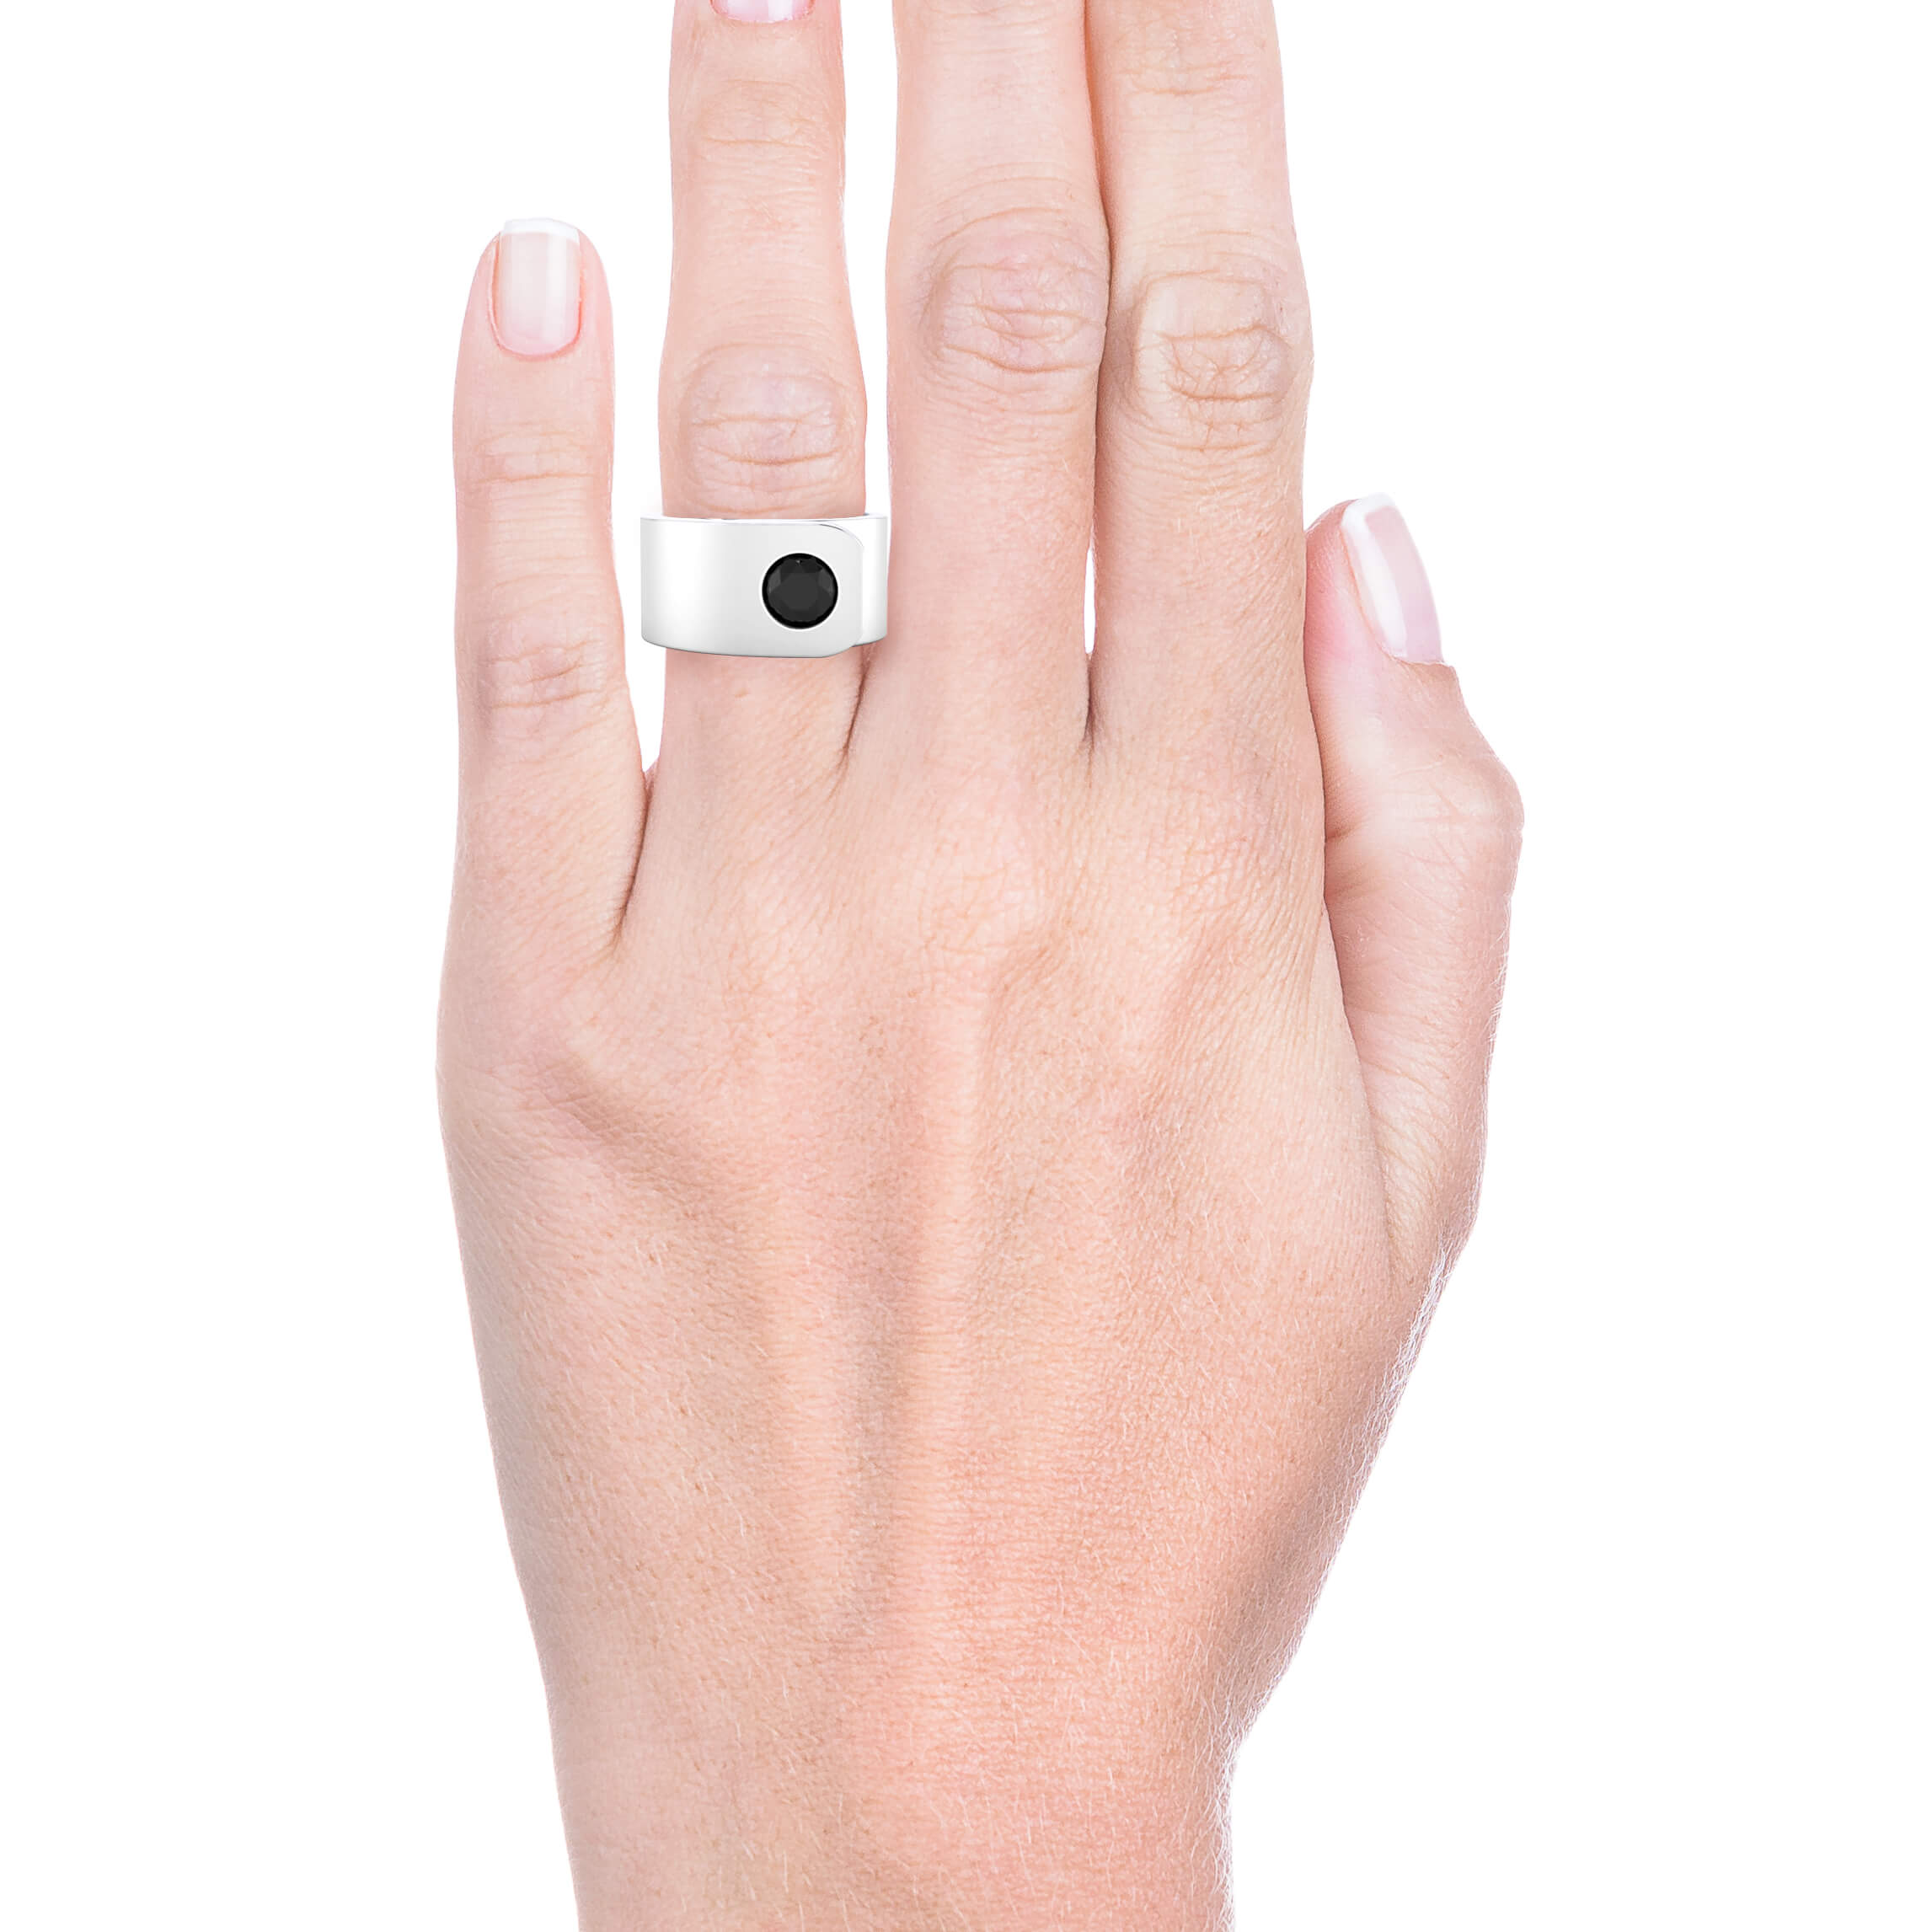 18k gold men ring with a black diamond.